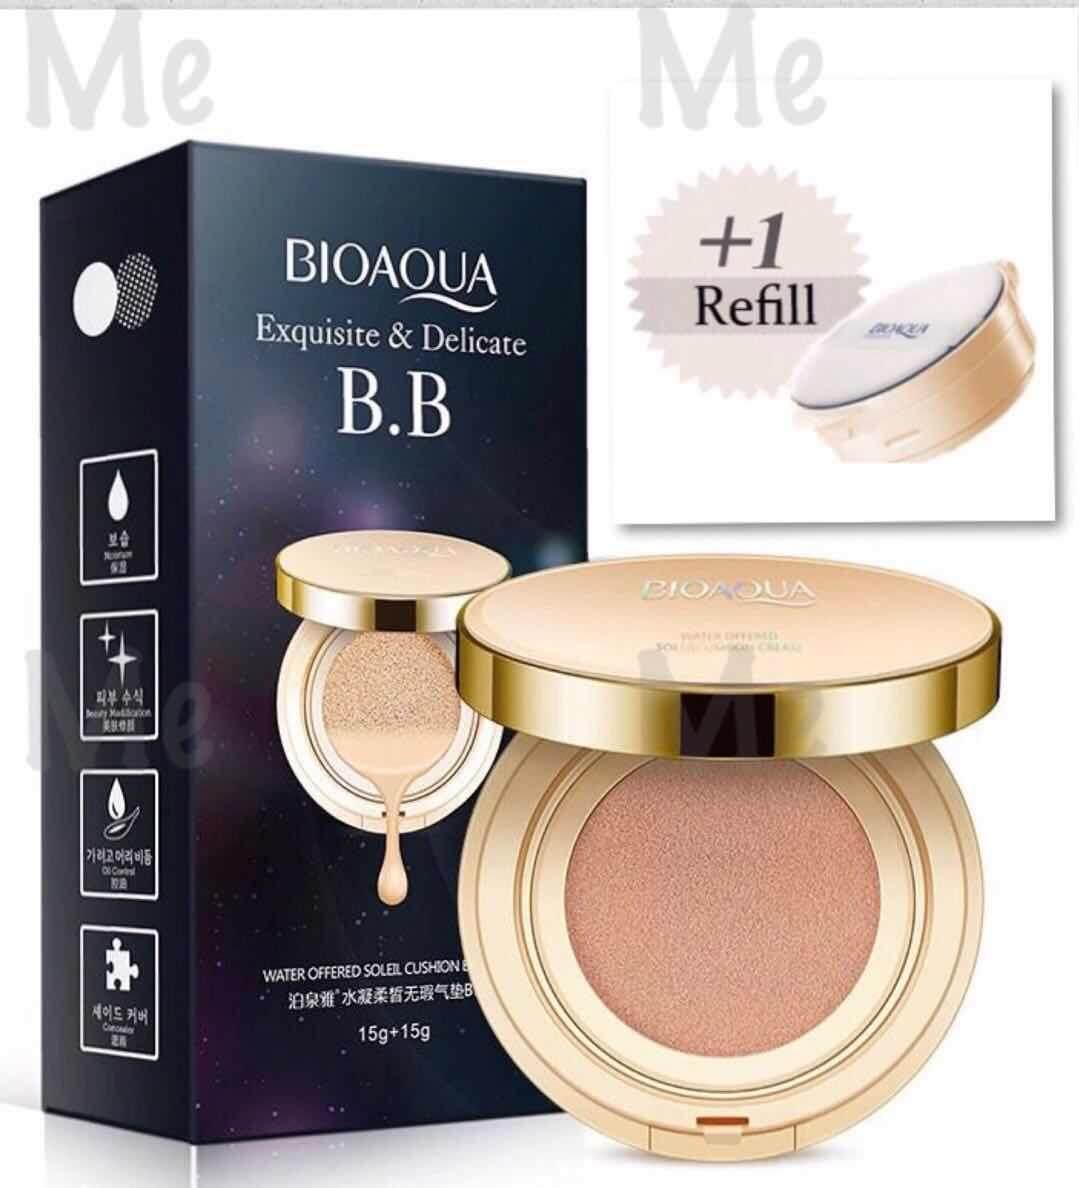 Fitur Refill Bioaqua Bb Cream Air Cushion Free Masker Bibir Dan Buy 1 1bioaqua 15g